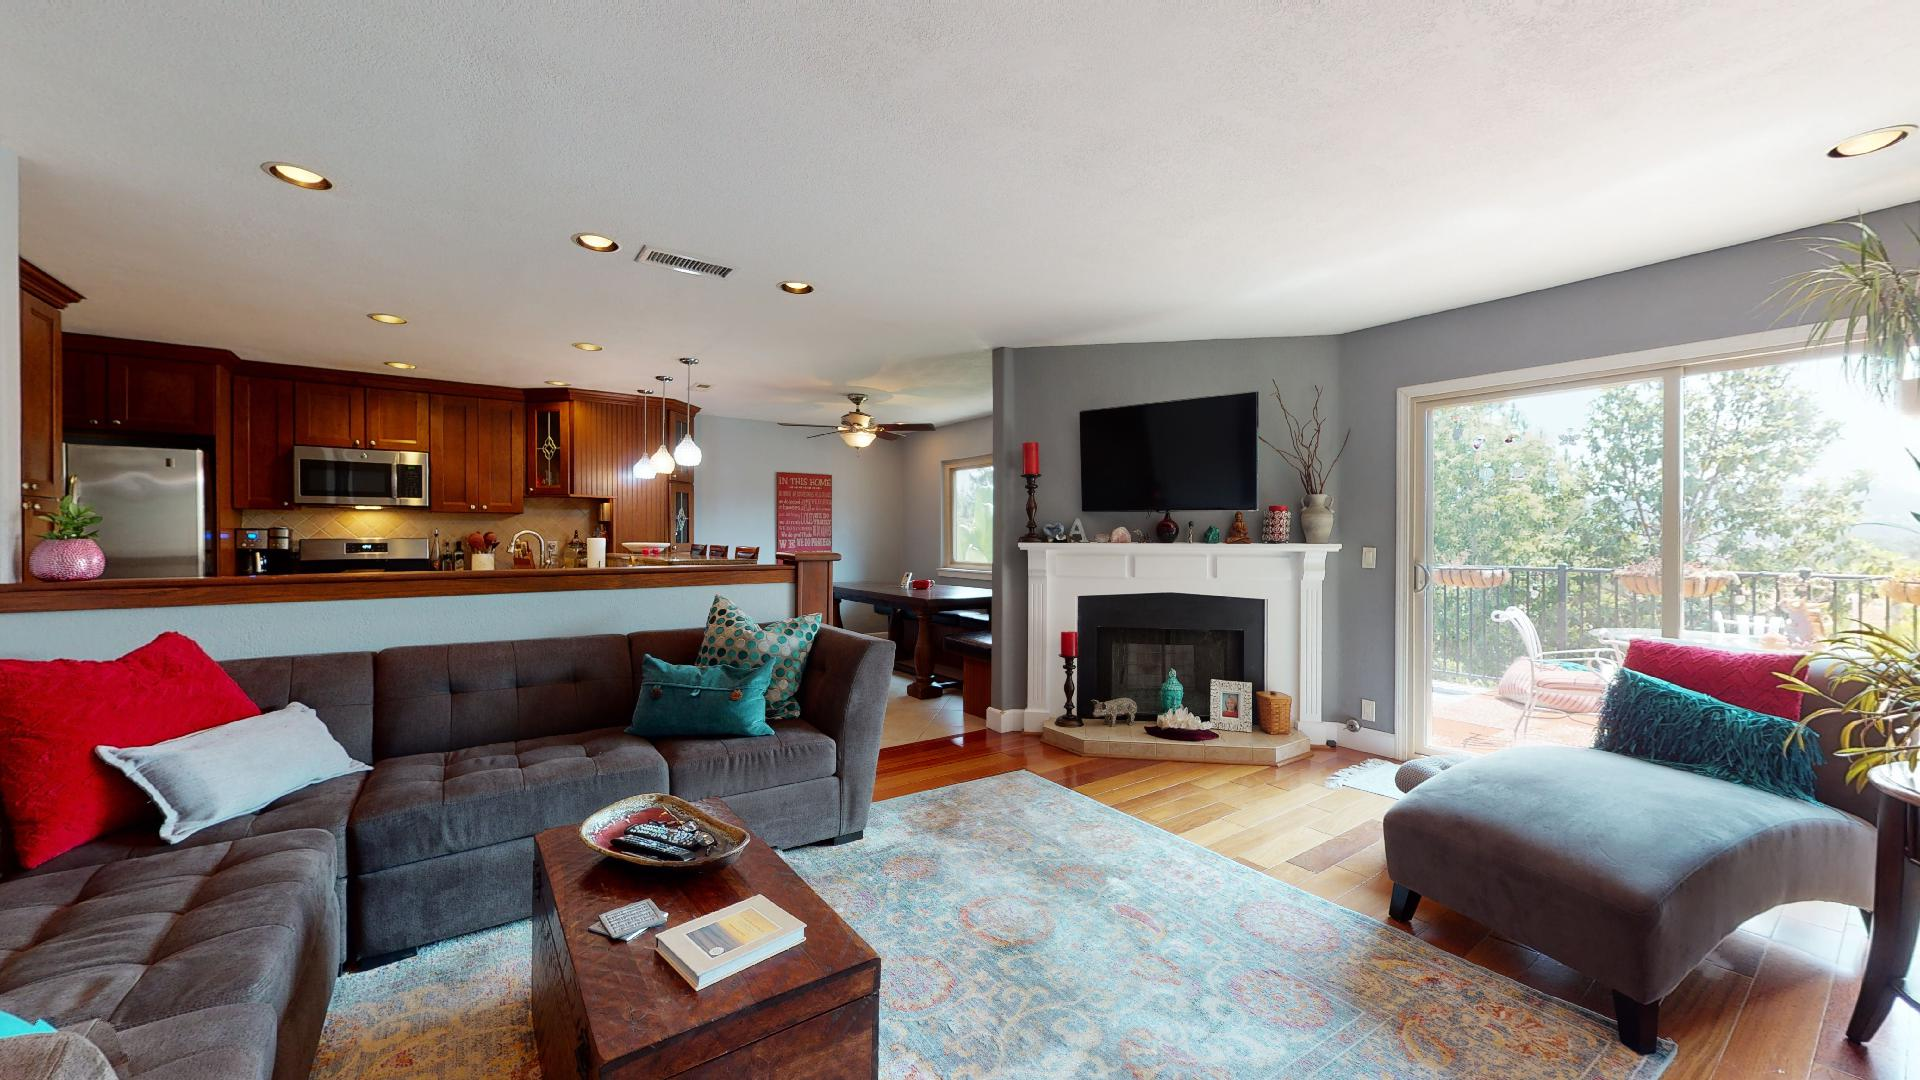 6577 Camino Capistrano living room with fireplace